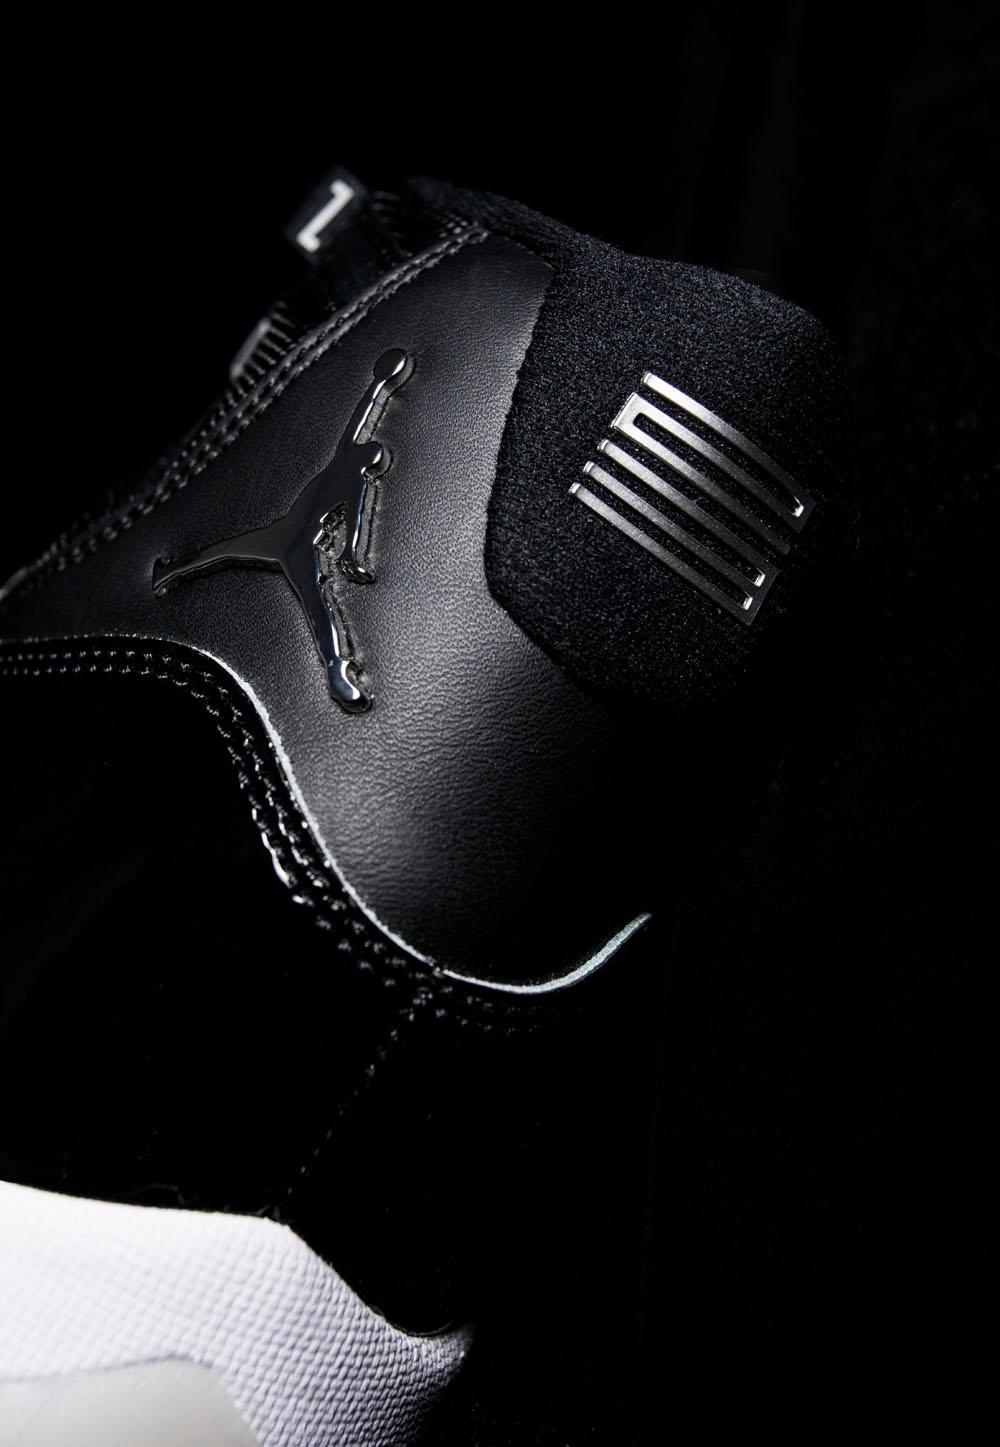 AJ11,Air Jordan 11,CT8012-011,  好酸啊!二十五周年 AJ11 今早专属突袭!谁买到了?